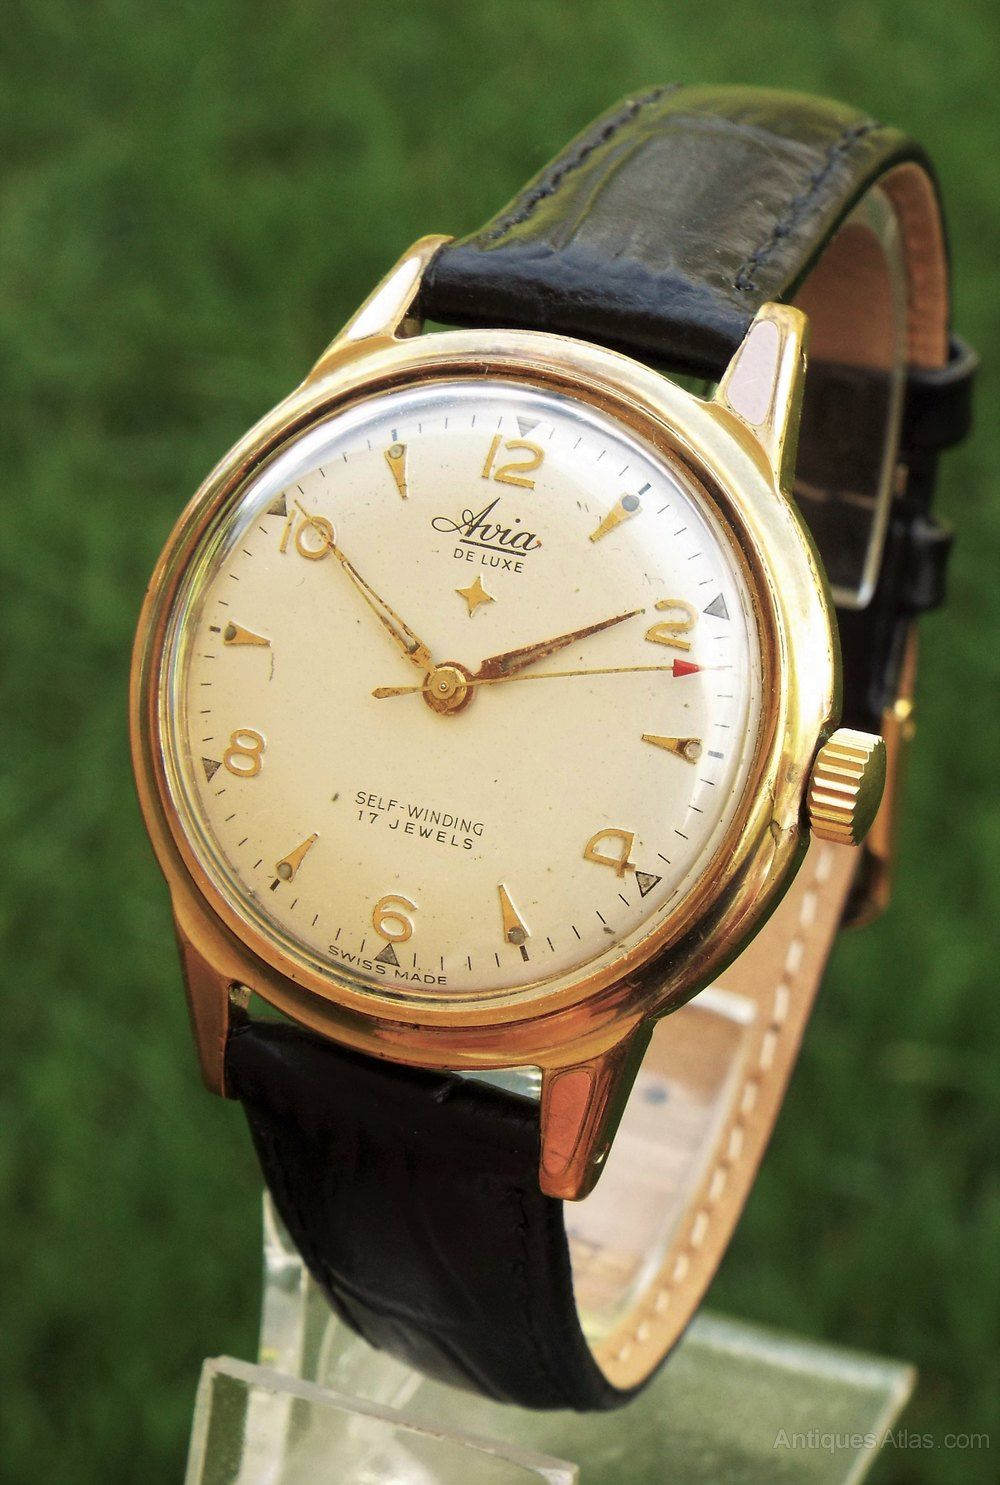 Antiques Atlas Gents 1950s Avia De Luxe Wrist Watch Vintage Watches For Men Antique Watches Wrist Watch